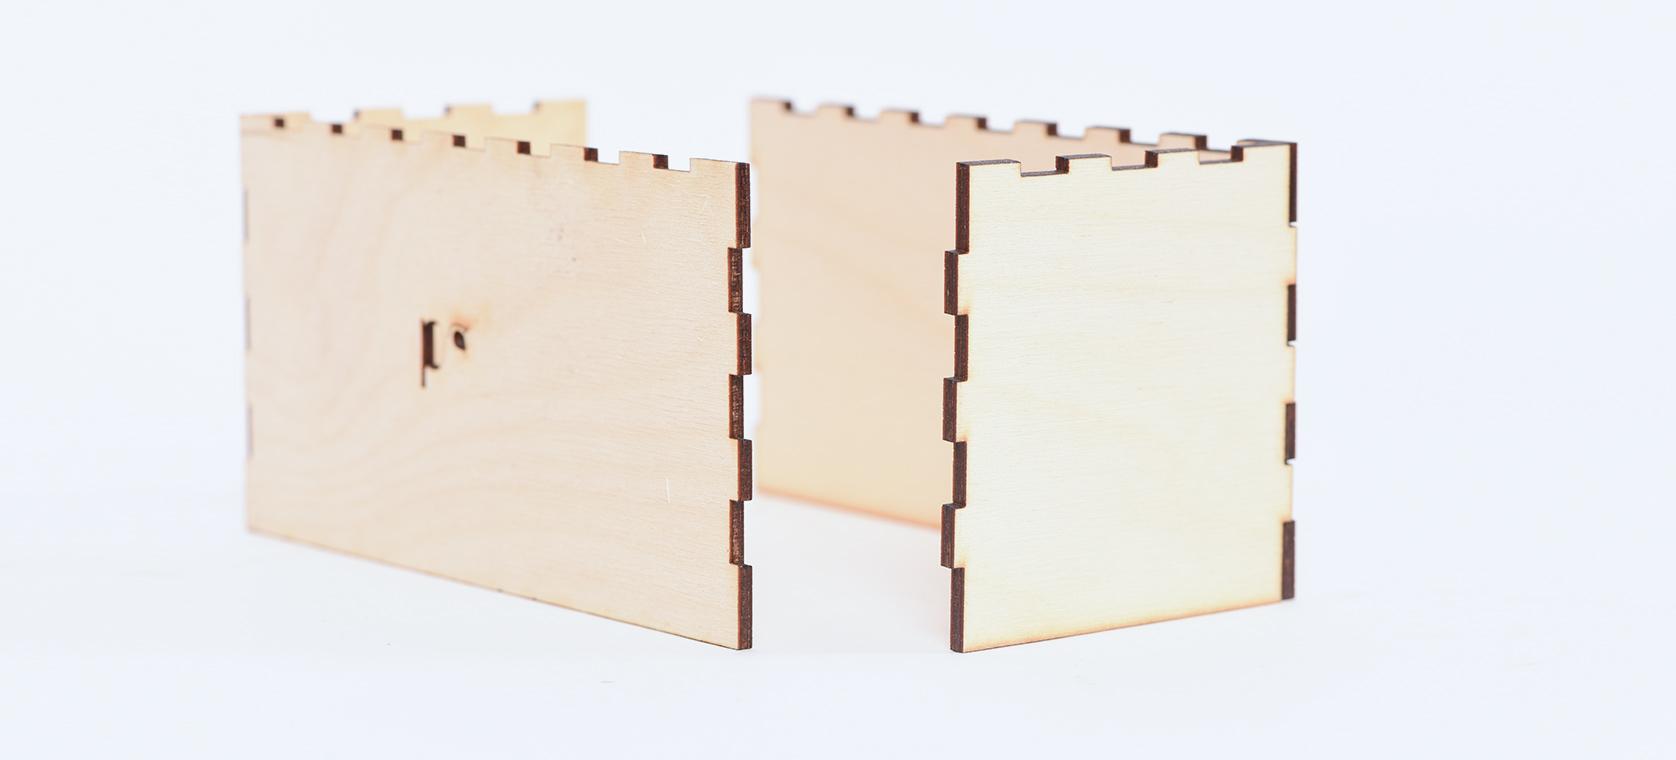 Failure Boxes Feature